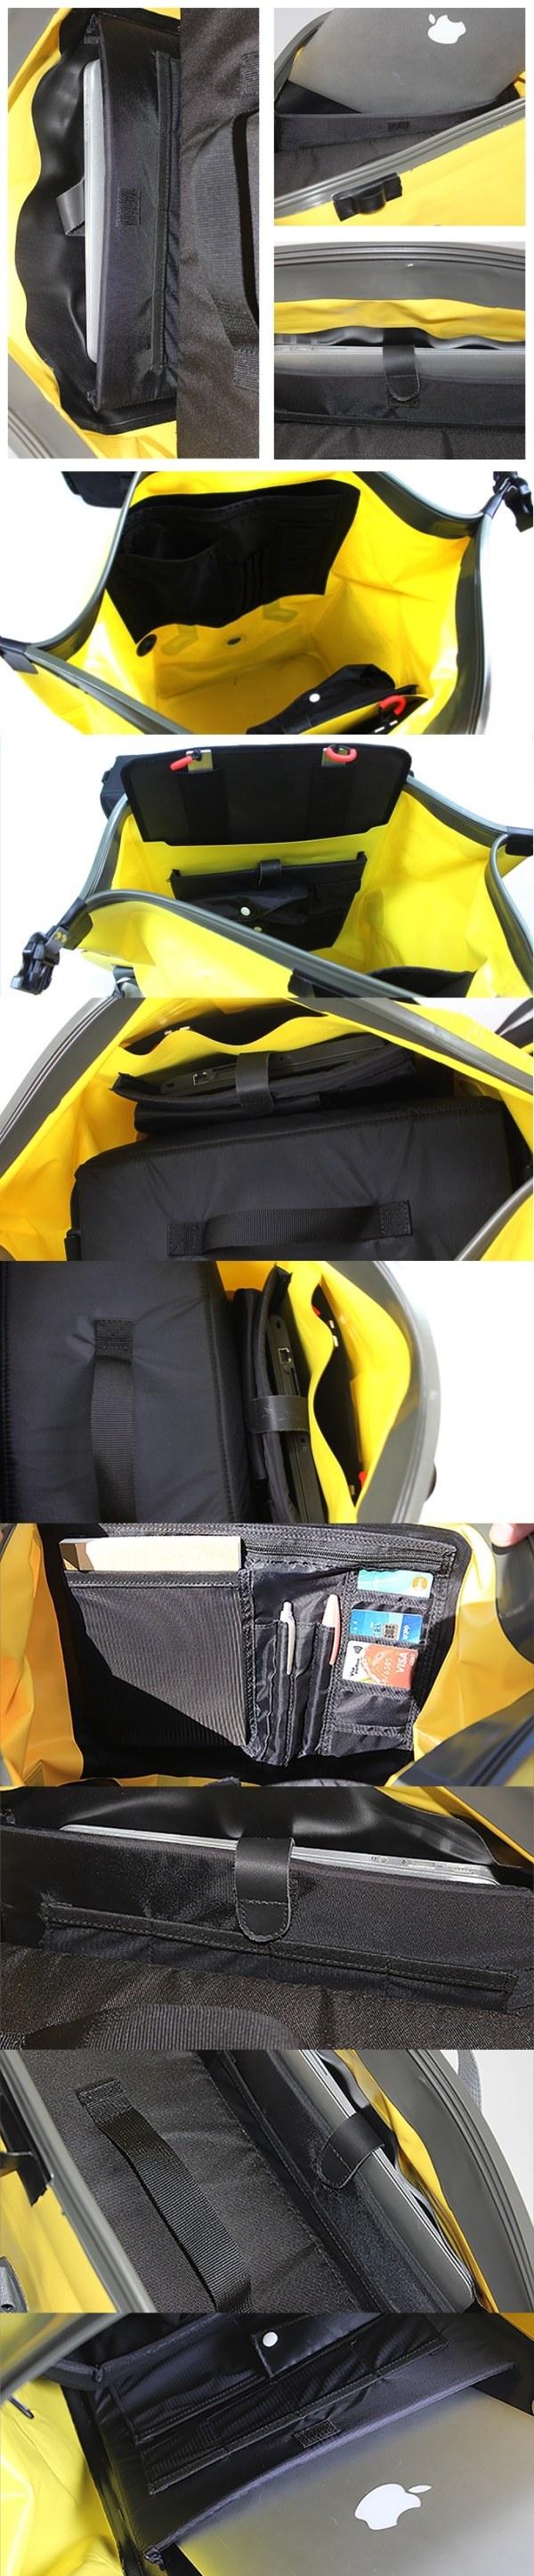 The Inrigo Waterproof Backpack image via Kickstarter